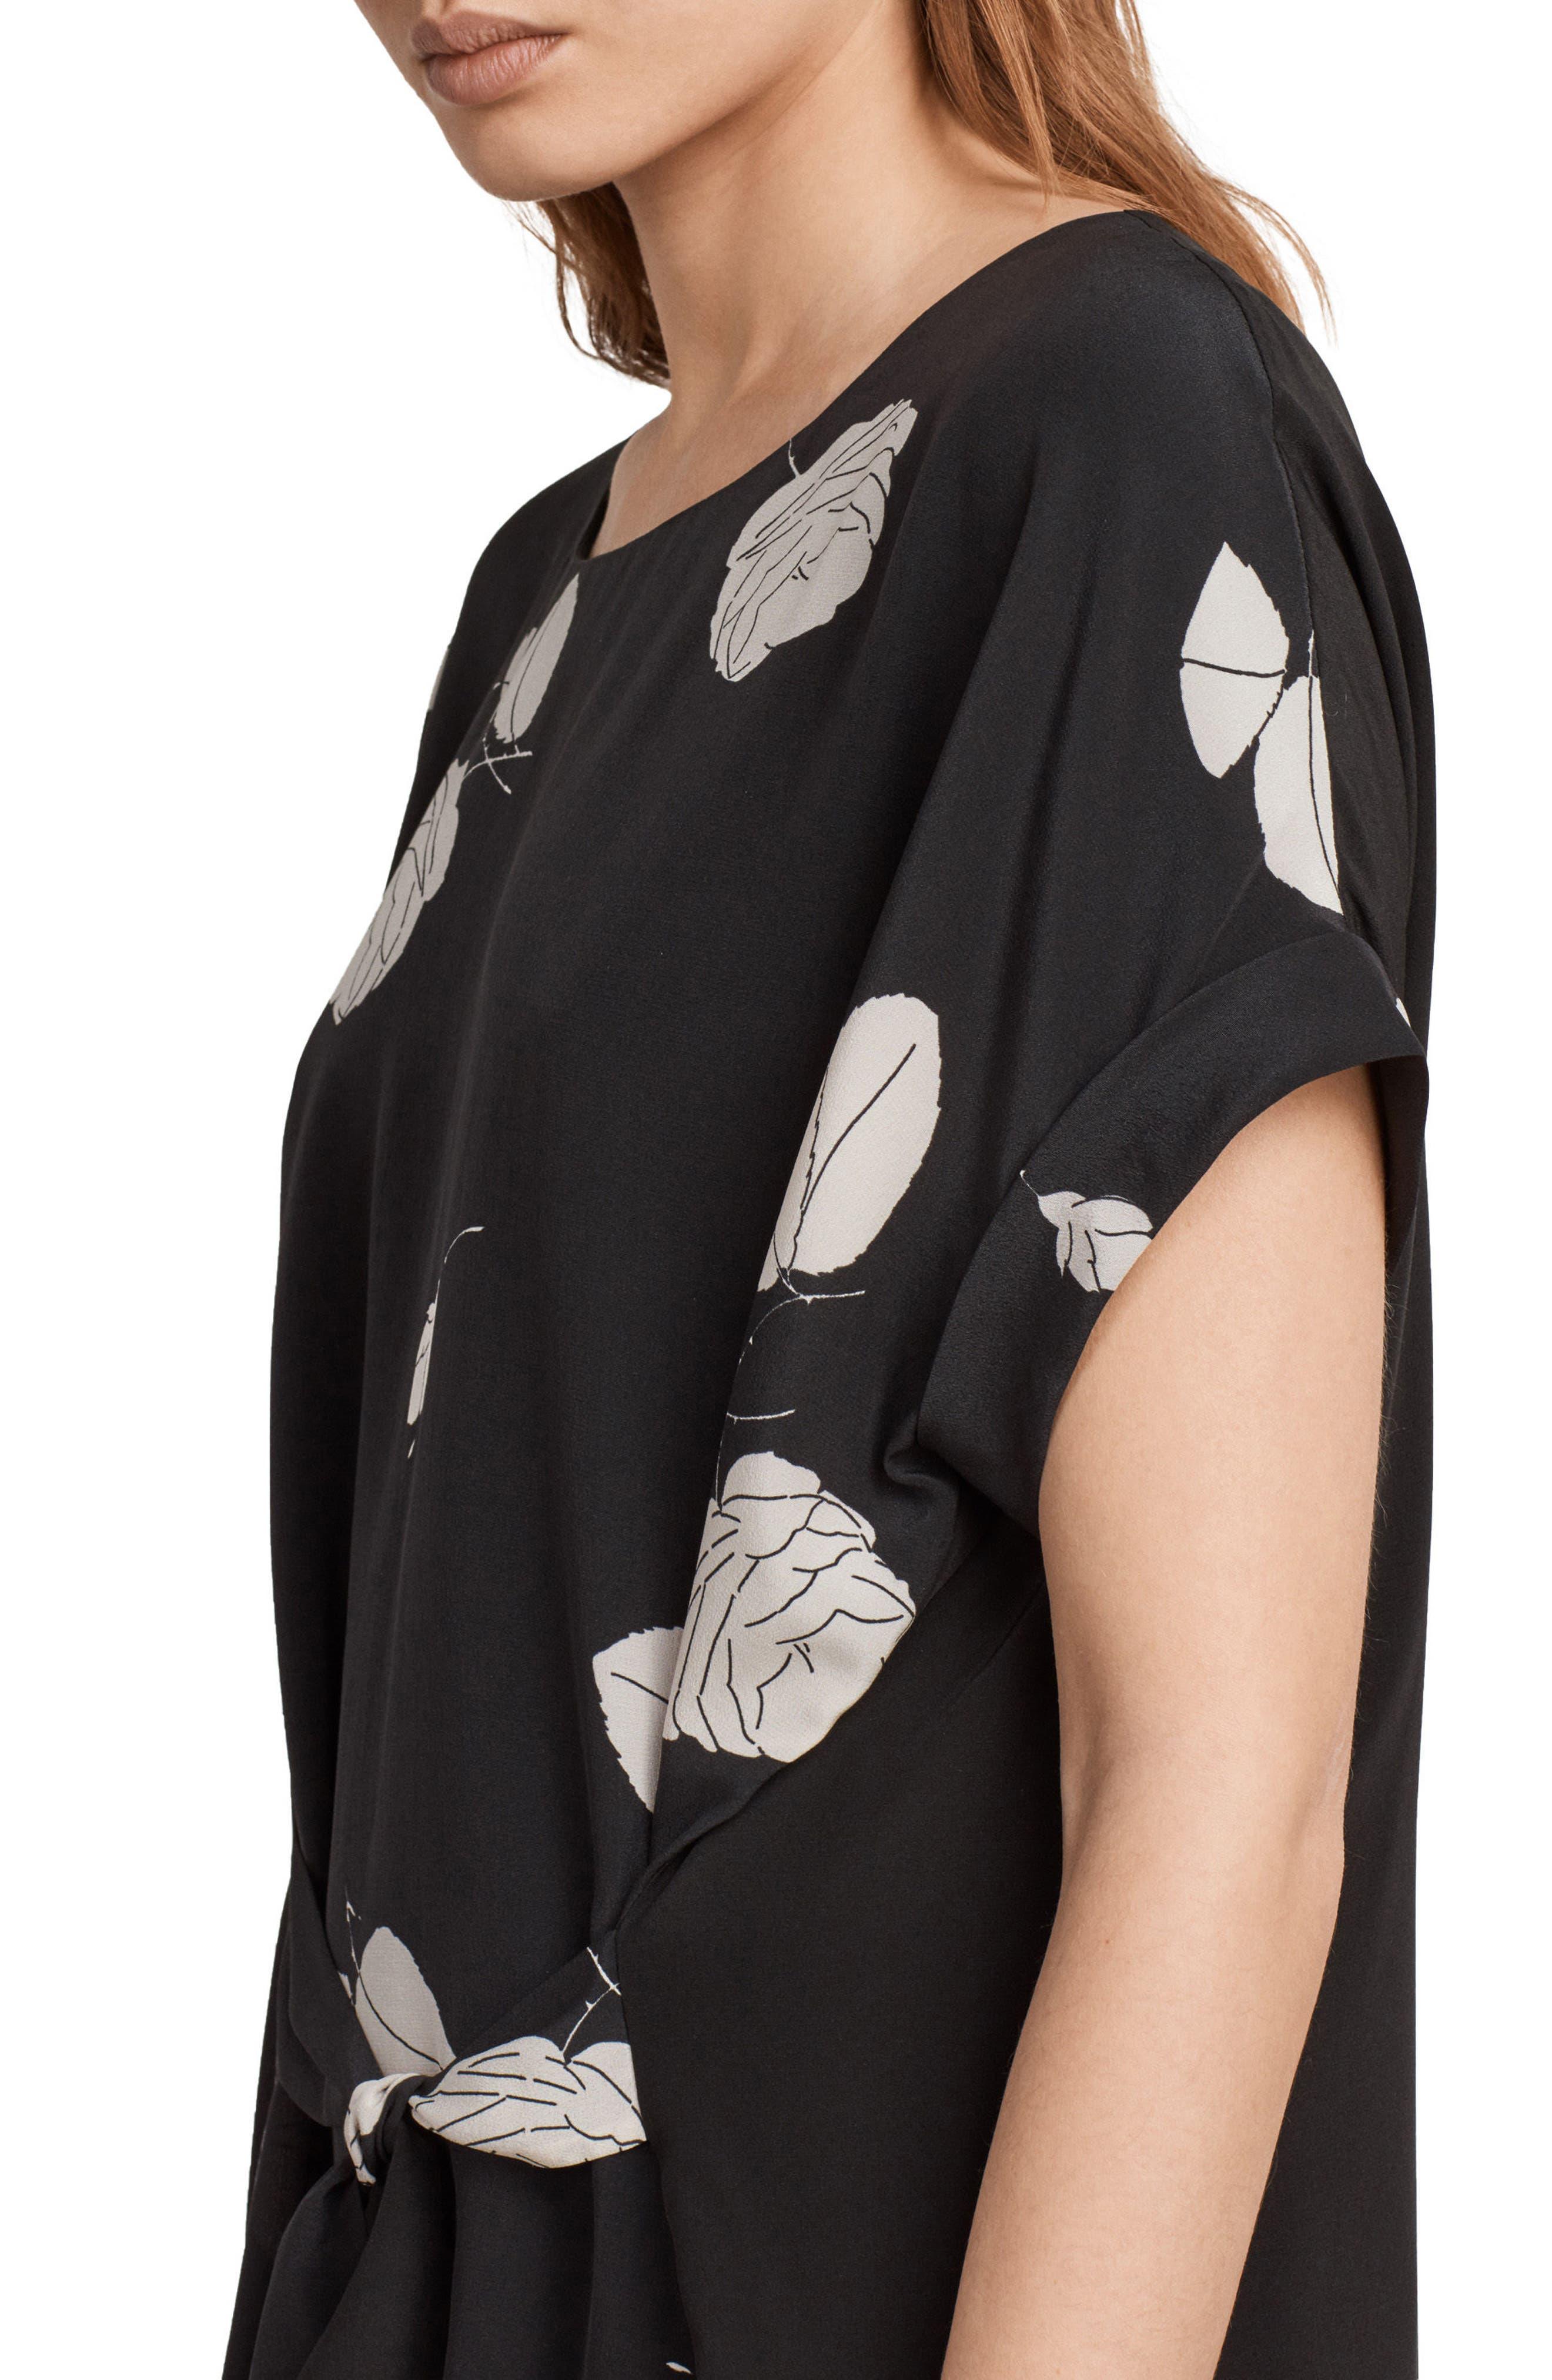 Sonny Rodin Silk Dress,                             Alternate thumbnail 4, color,                             001